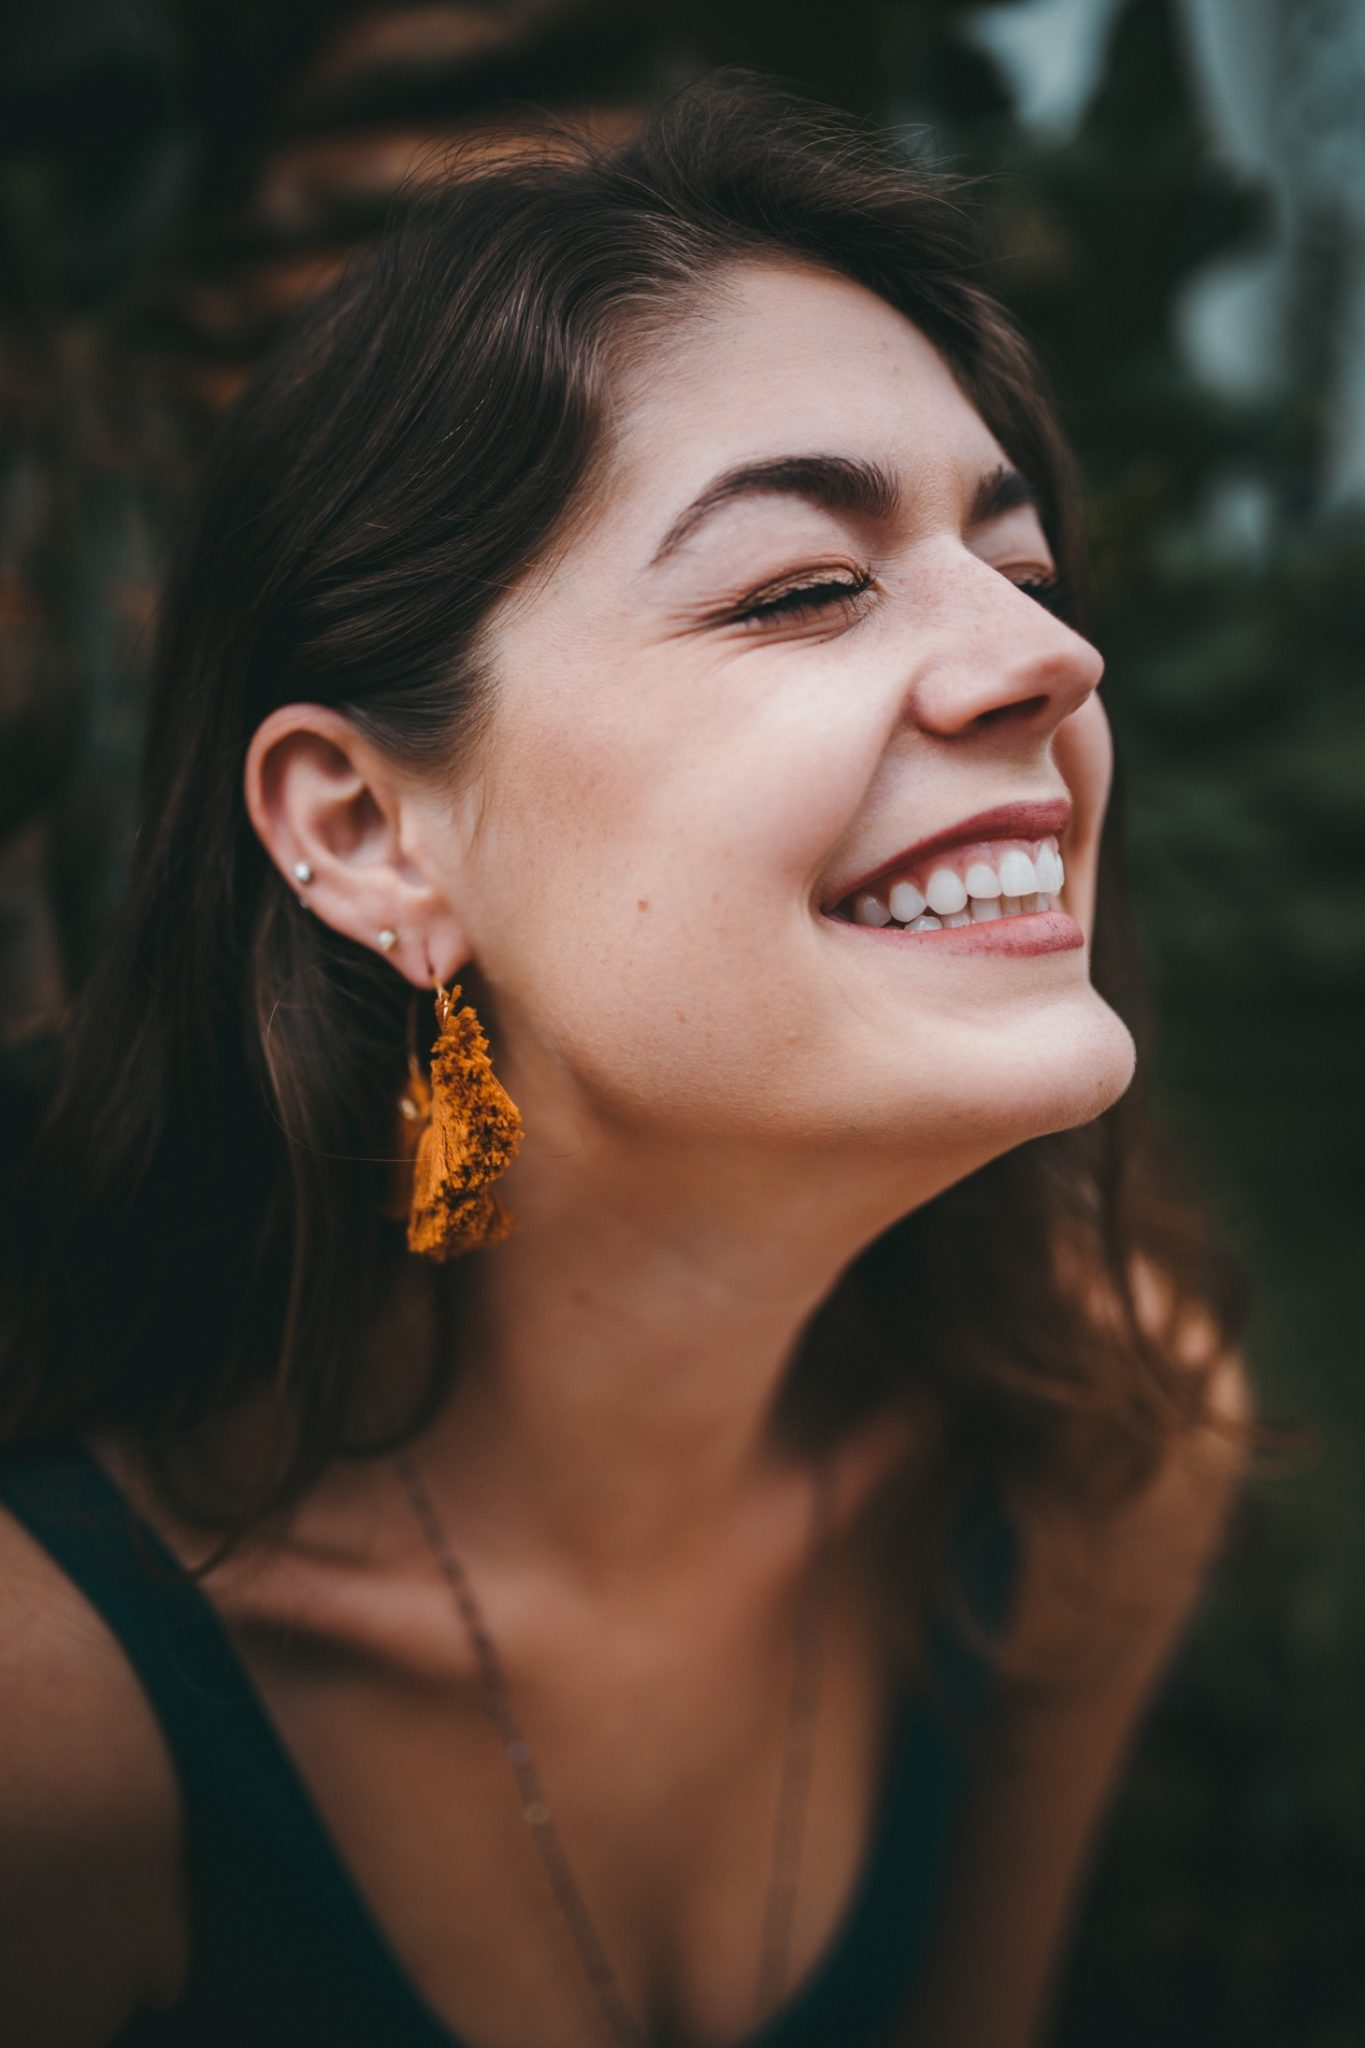 Image d'illustration femme sourire 2